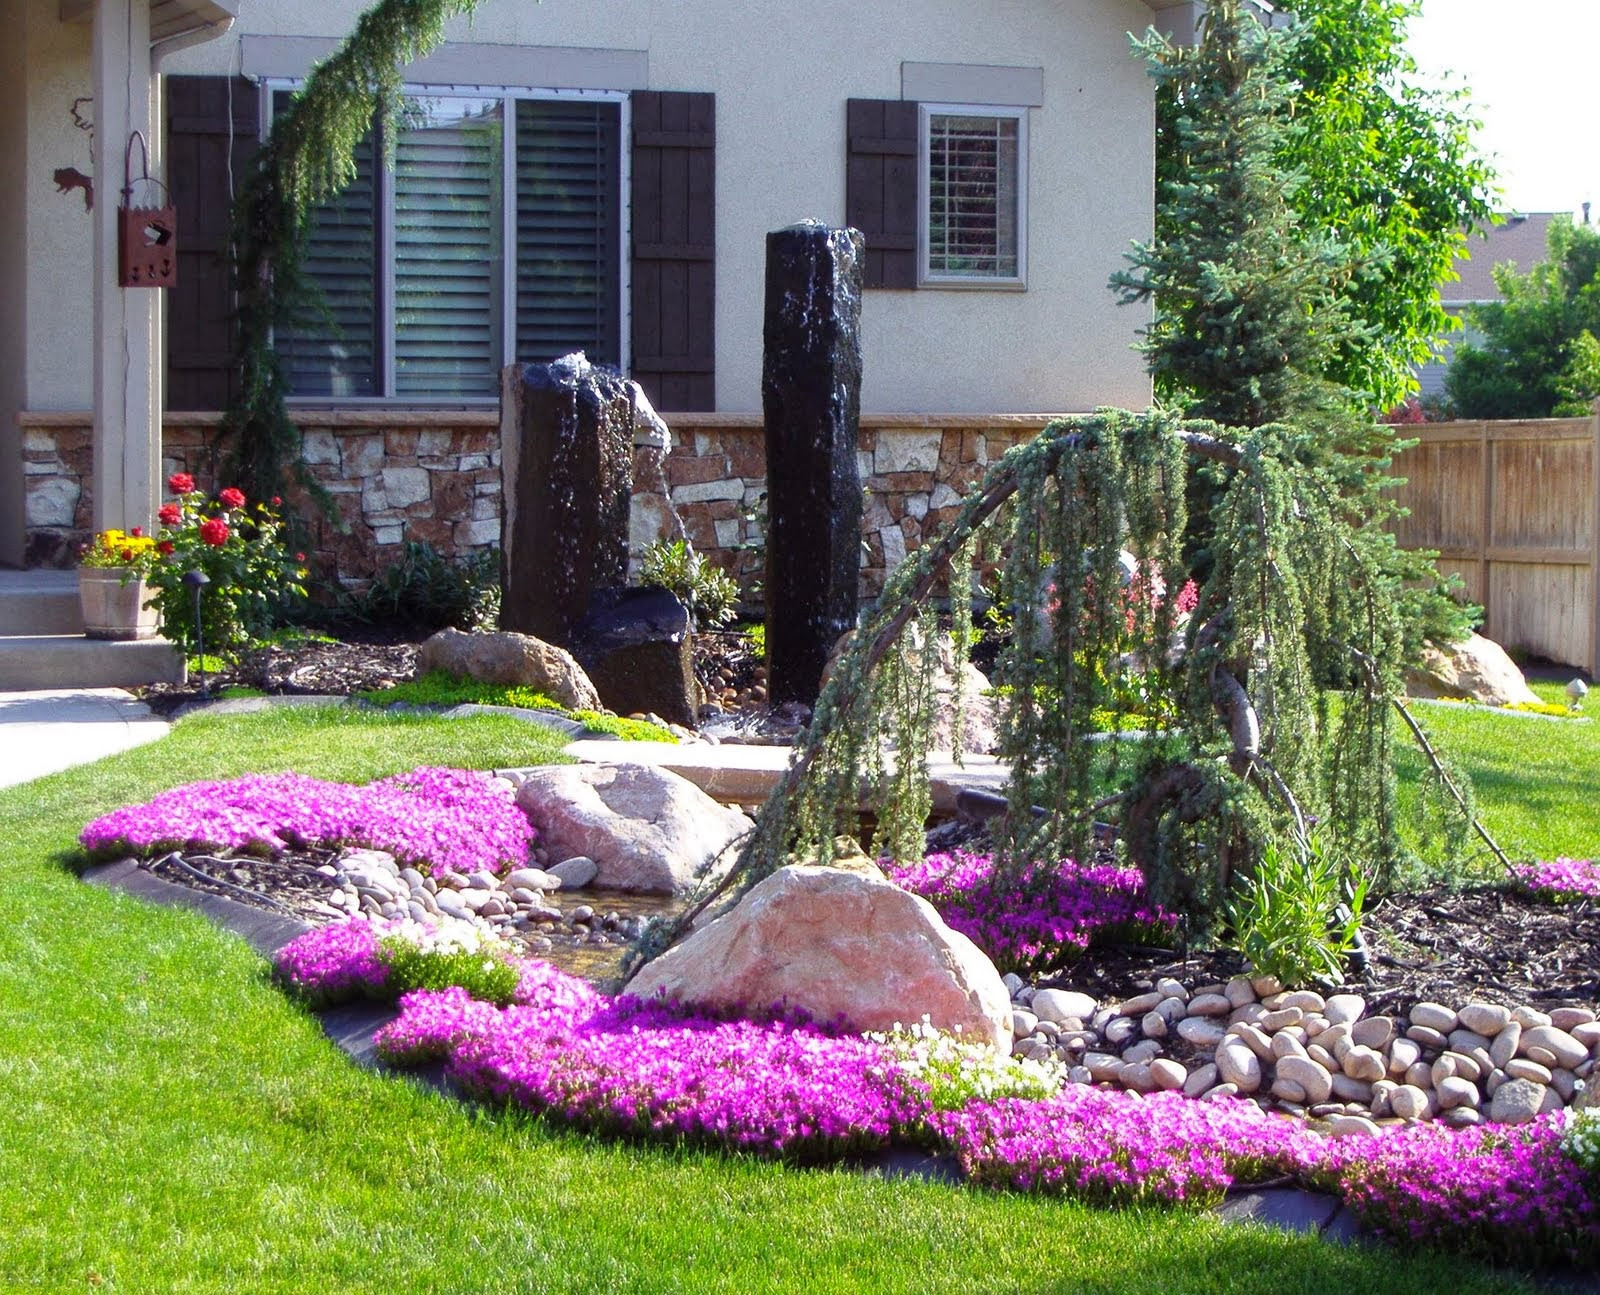 Landscape Design Front Yards  Gardening and Landscaping Front Yard Landscaping Ideas